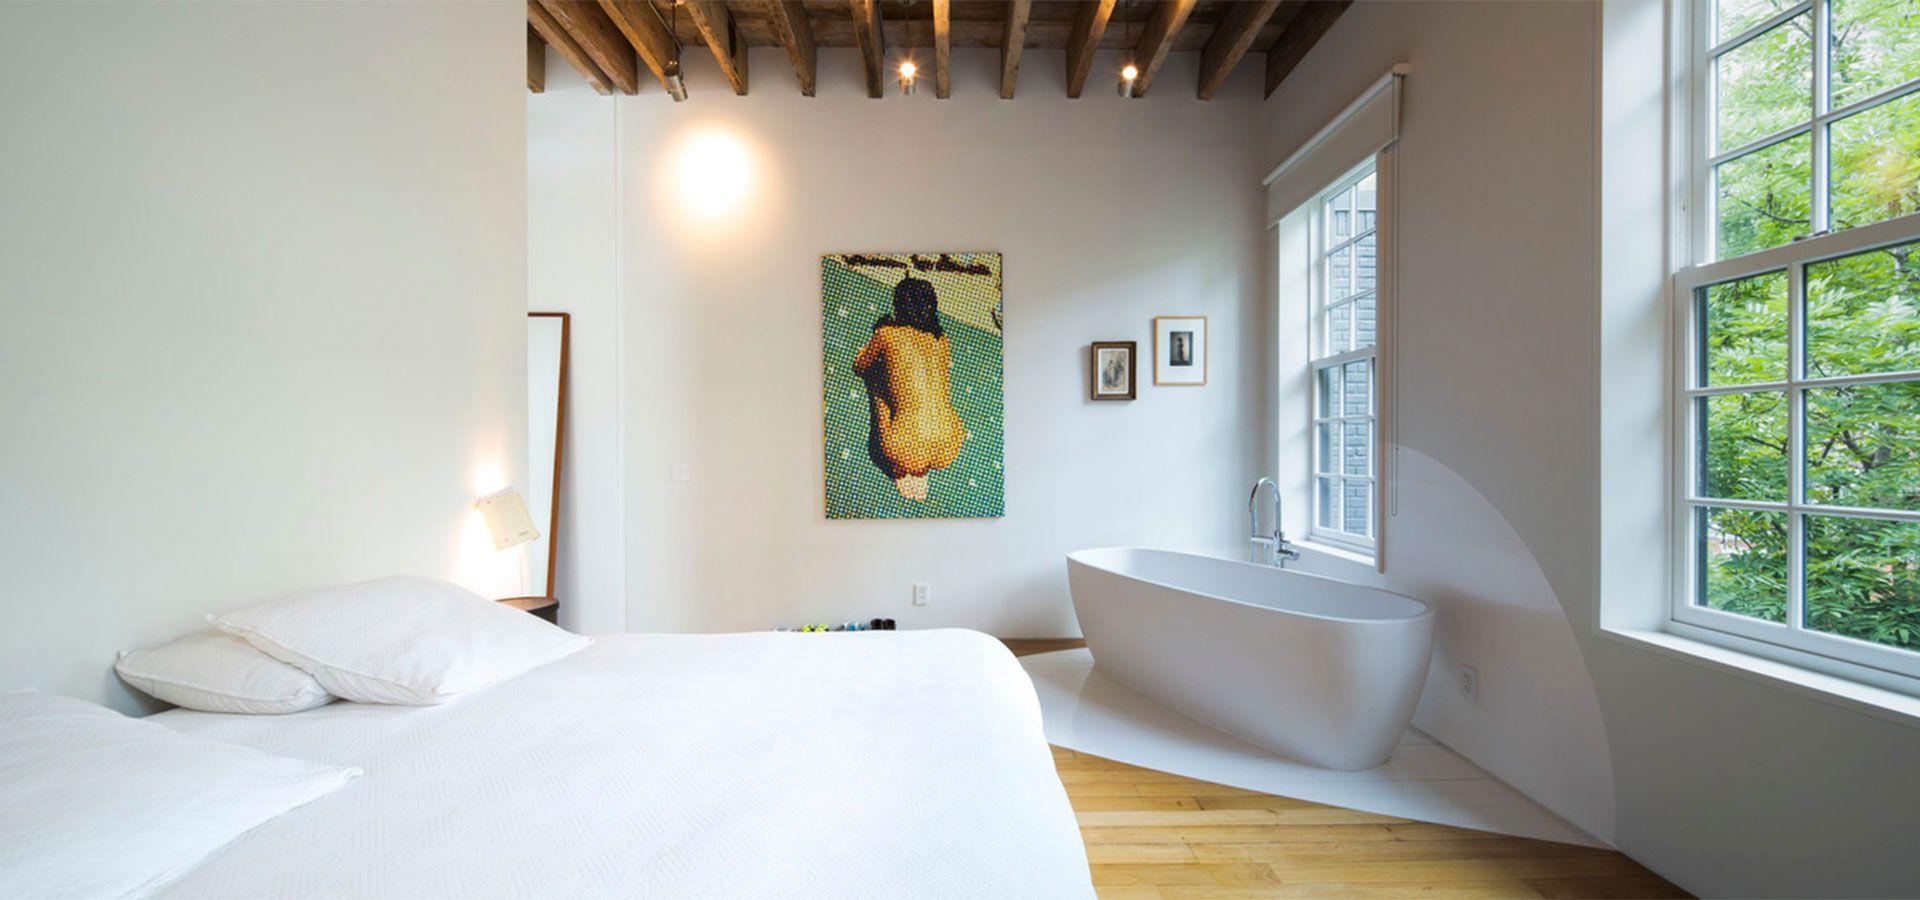 Salle De Bains Houzz | Stéphanie Coutasstephanie Coutas Reinvents ...